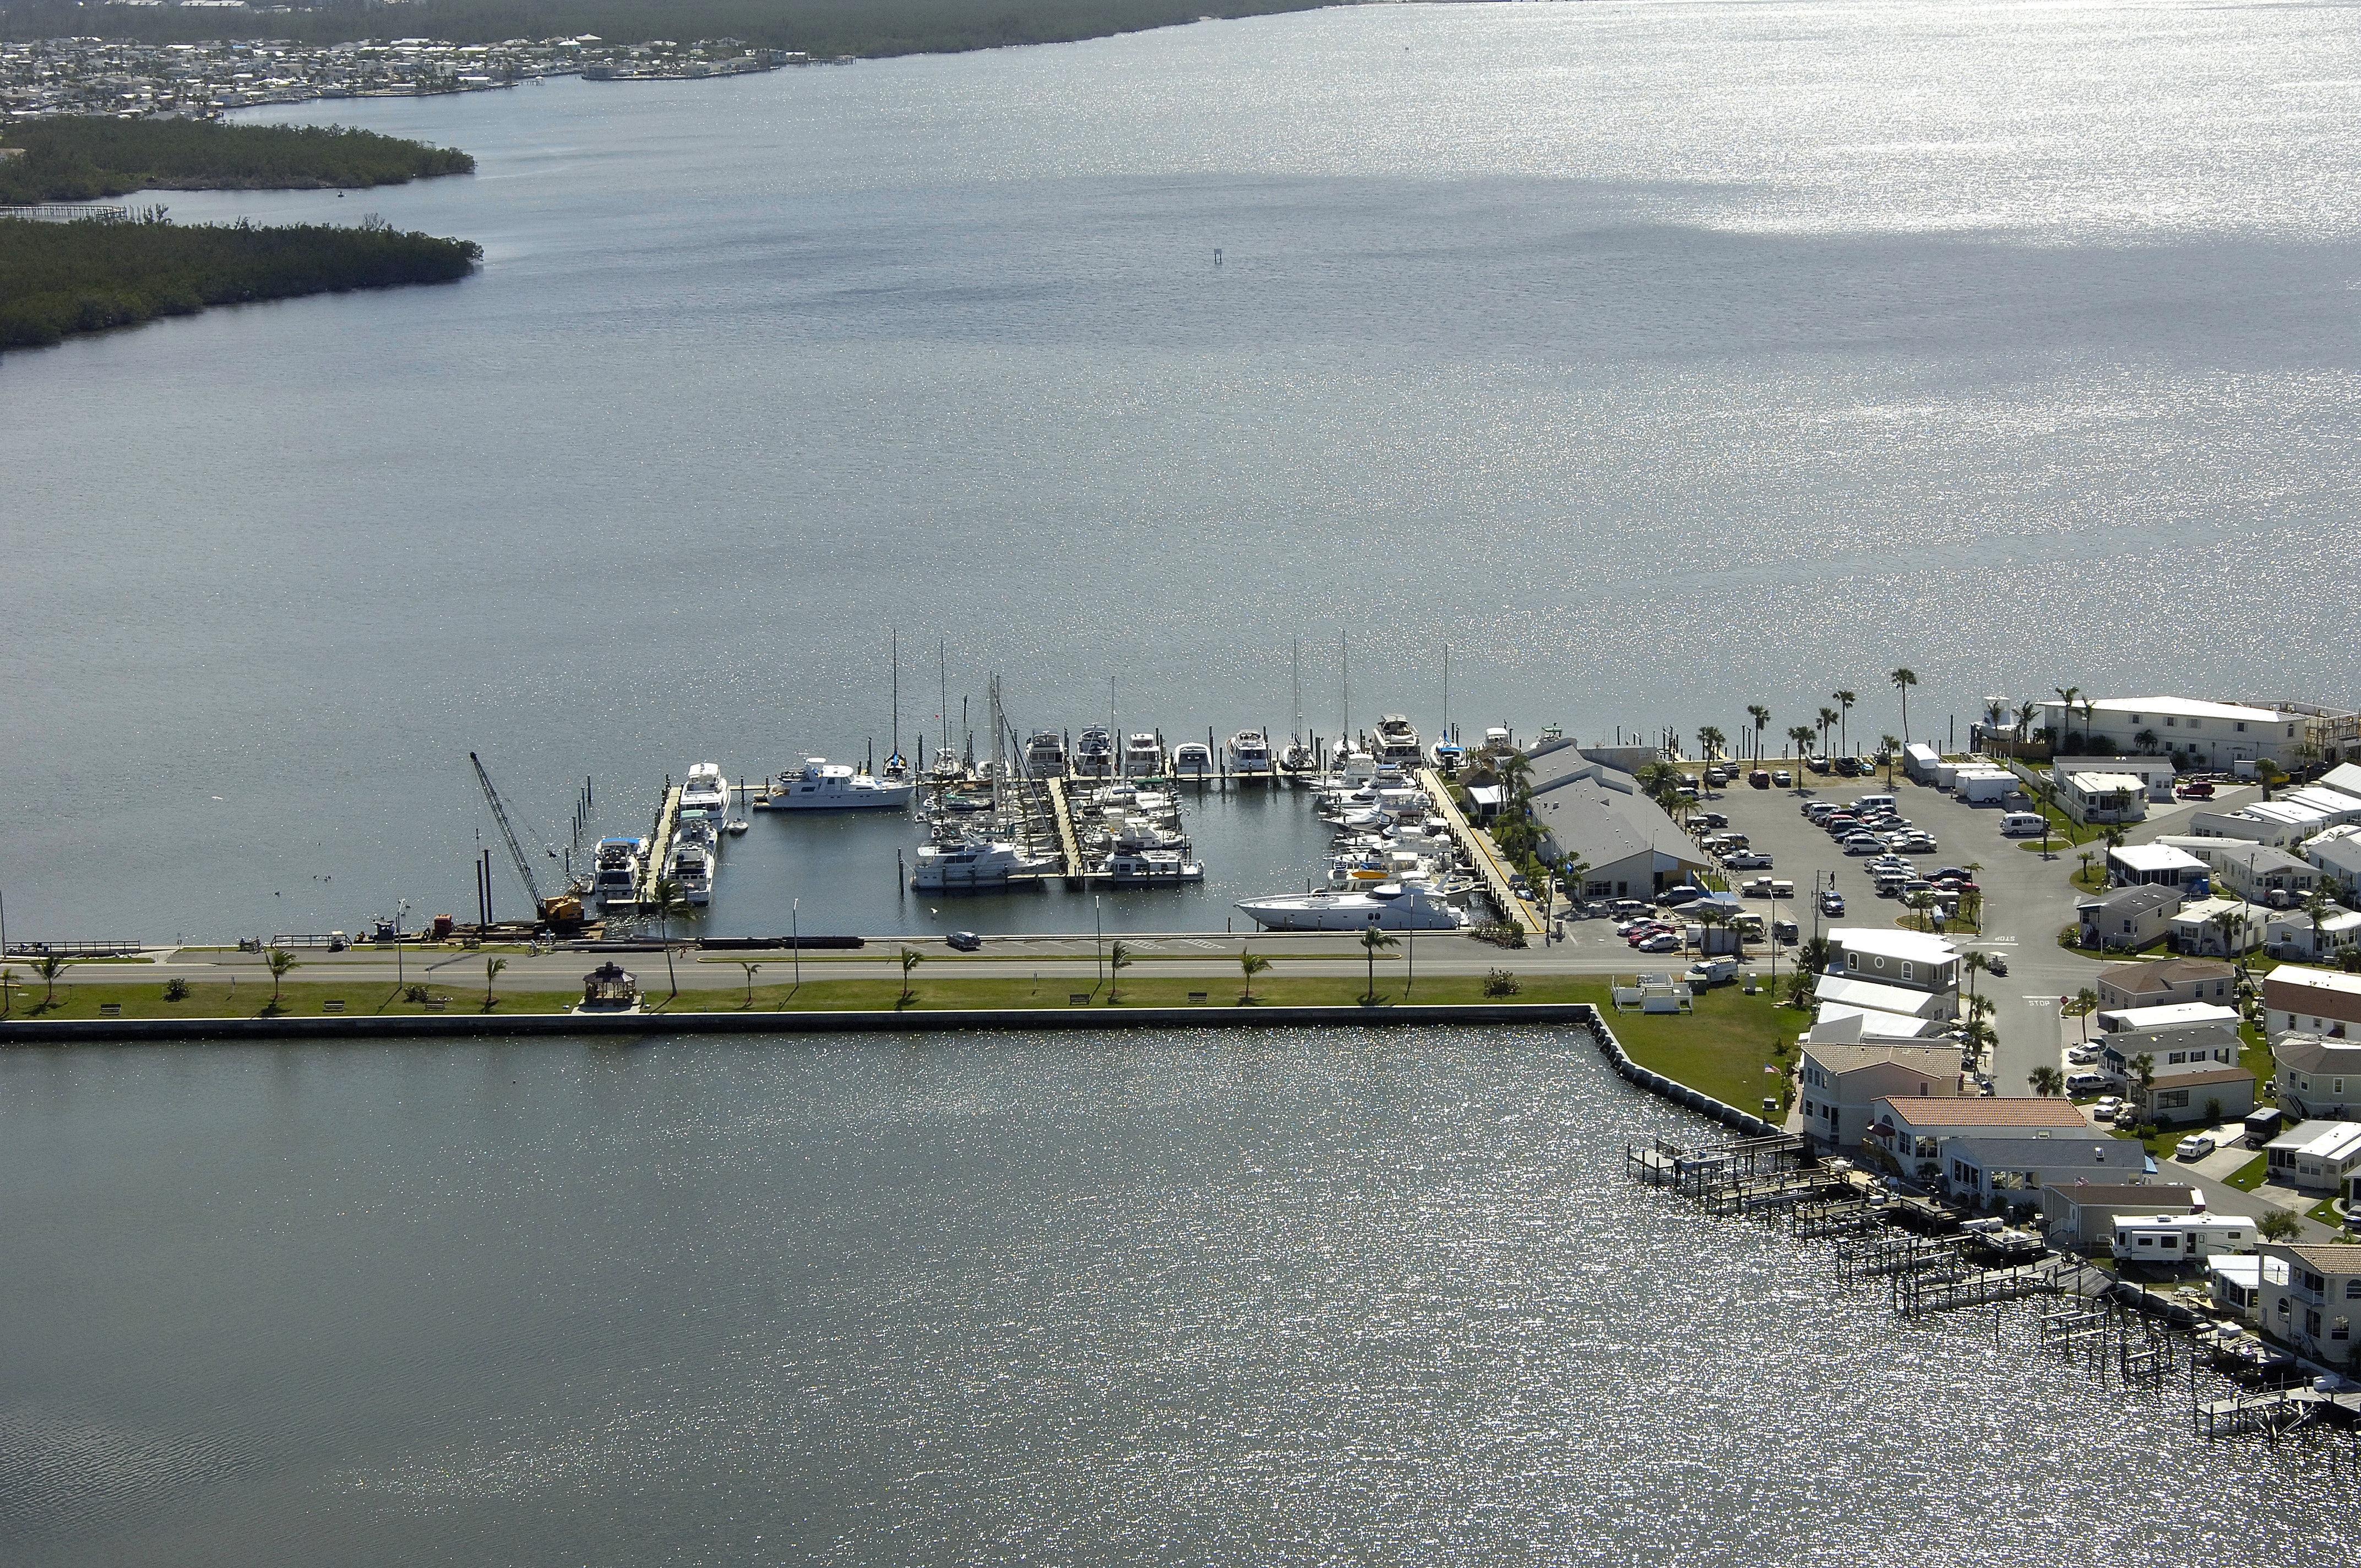 Nettles Island Florida Map.Nettles Island Marina In Jensen Beach Fl United States Marina